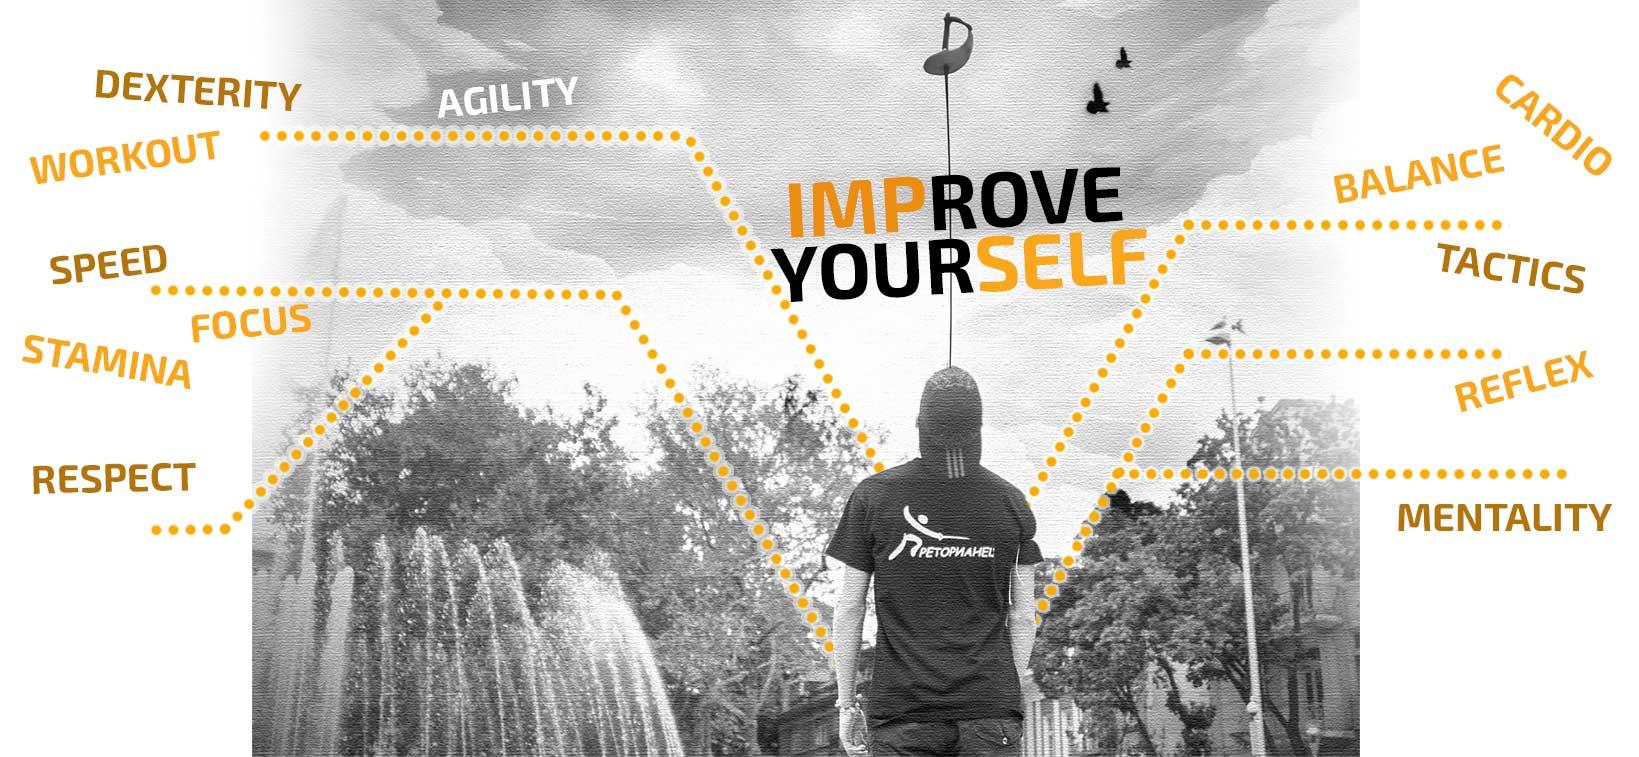 improve yourself, dexterity, workout, speed, focus, stamina, respect, balance, cardio, tactics, reflex, mentality